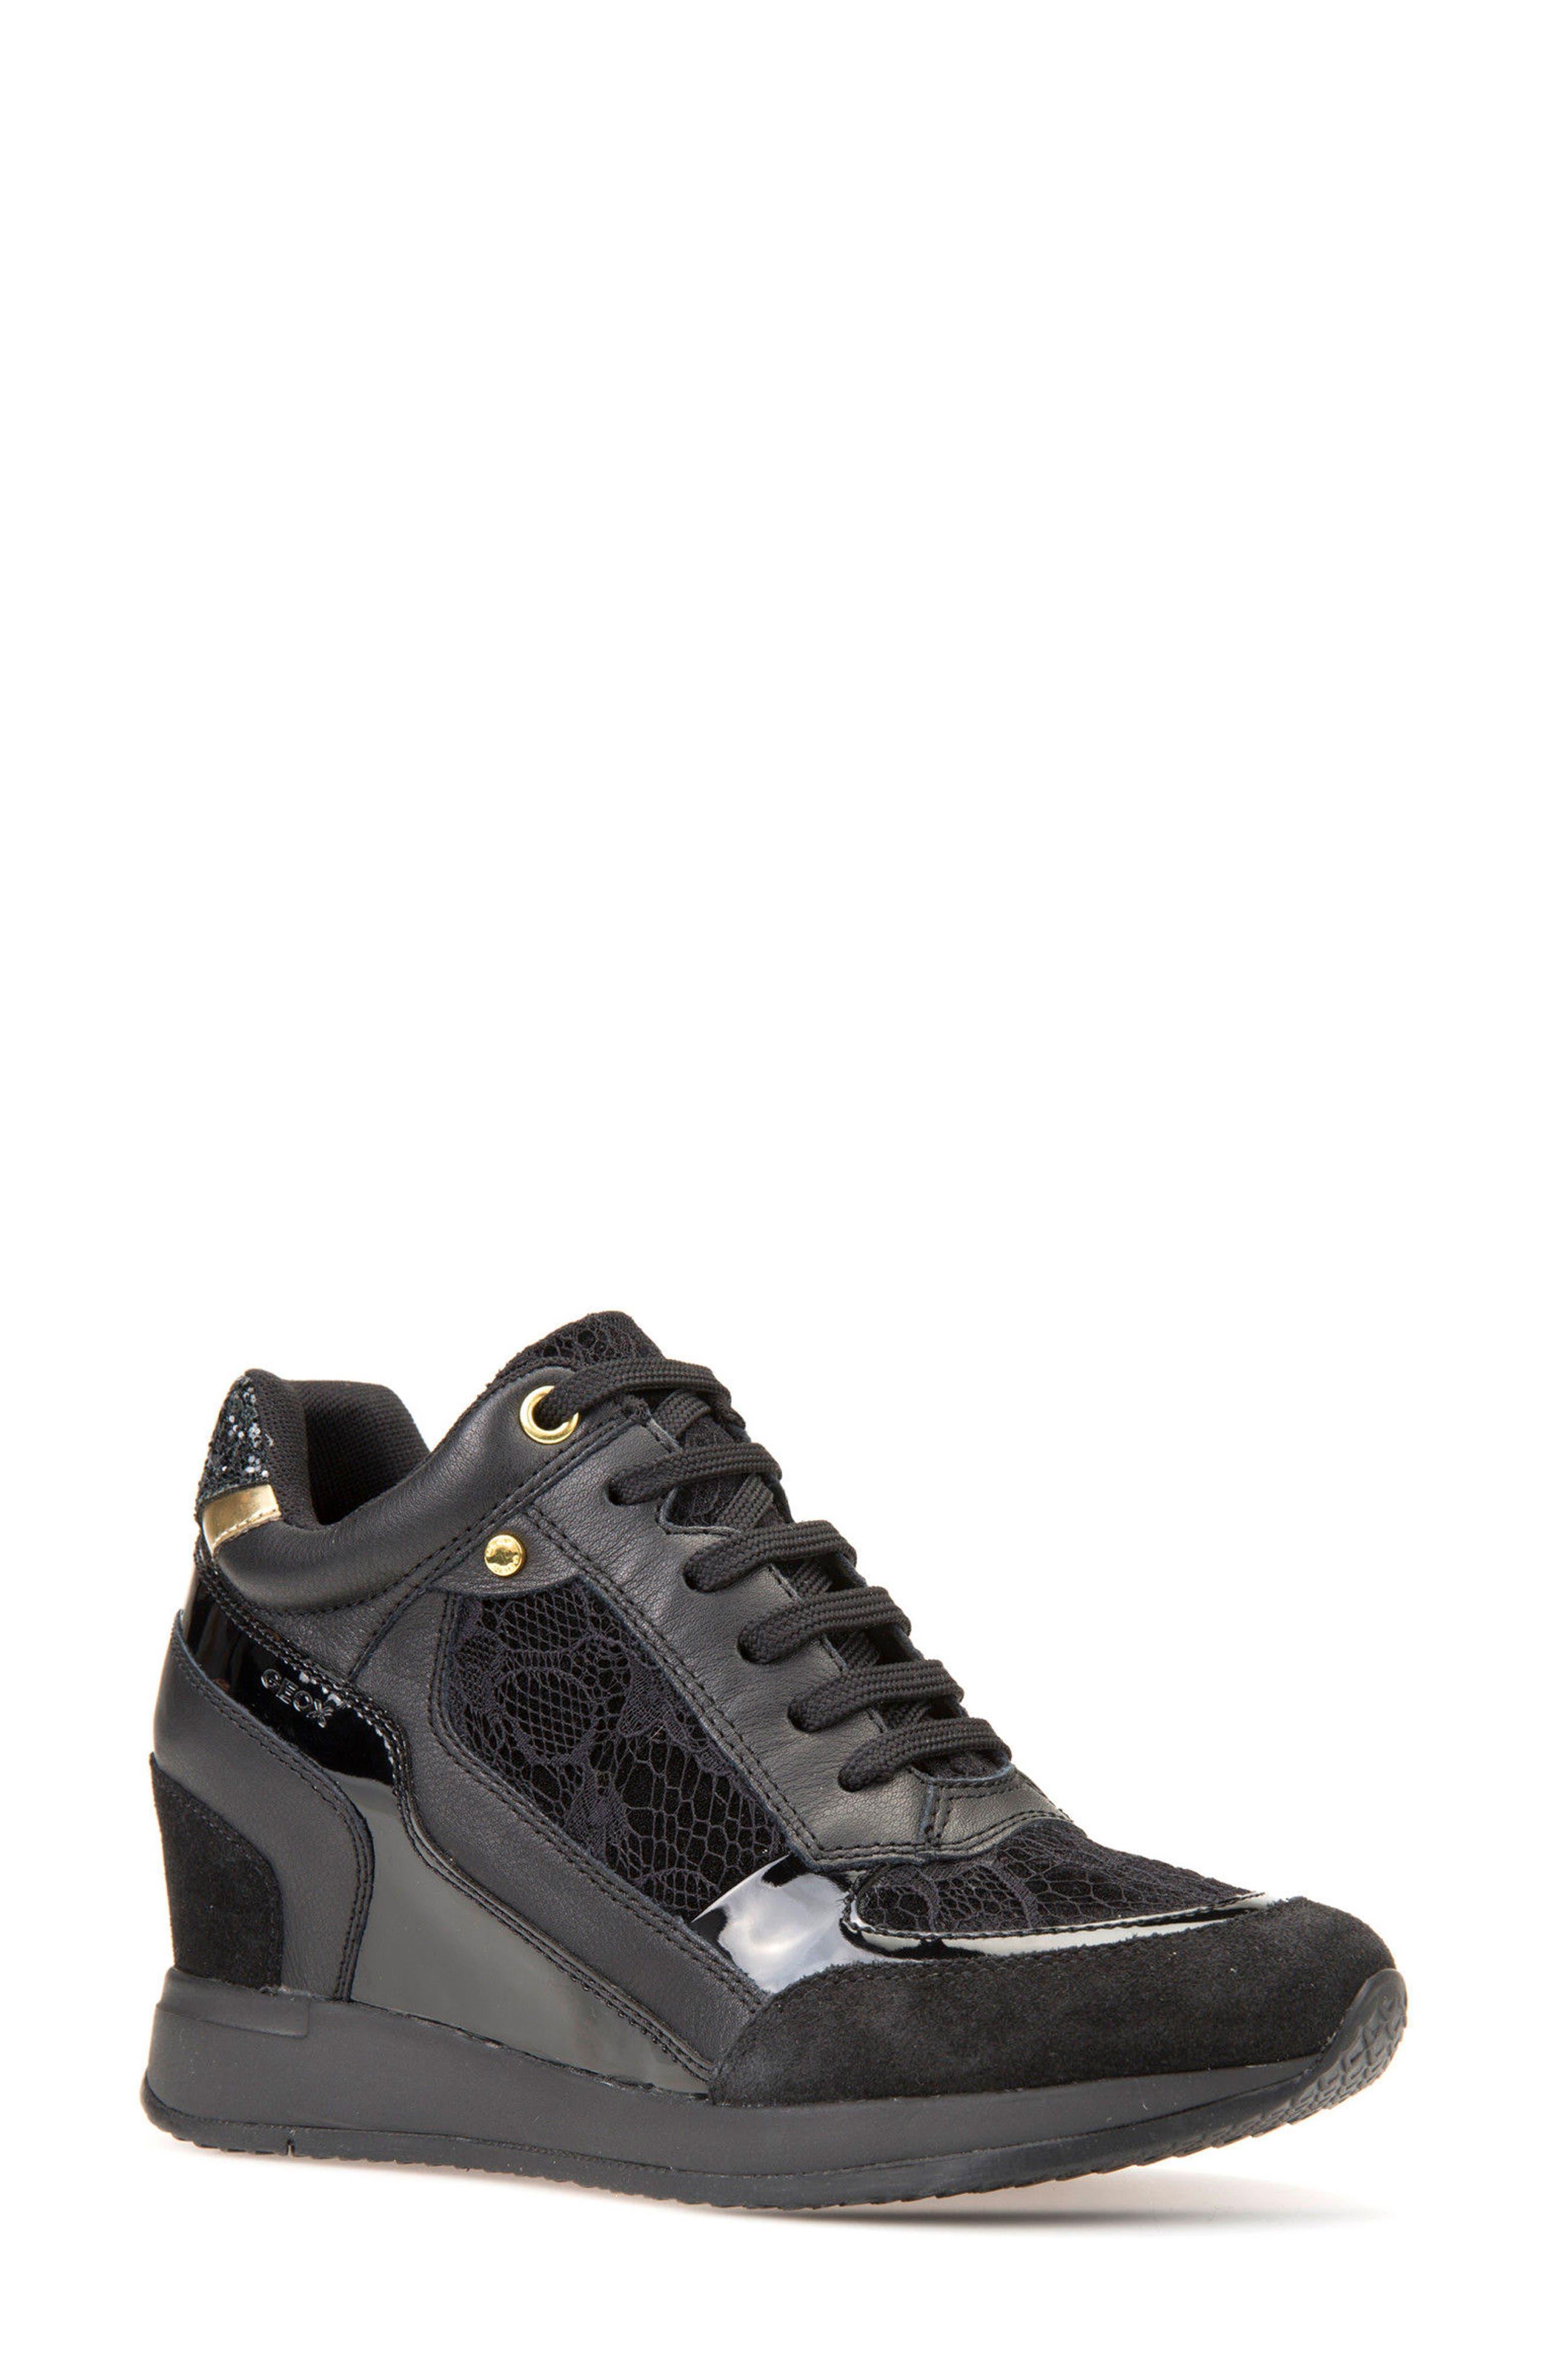 Geox Nydame Wedge Sneaker (Women)